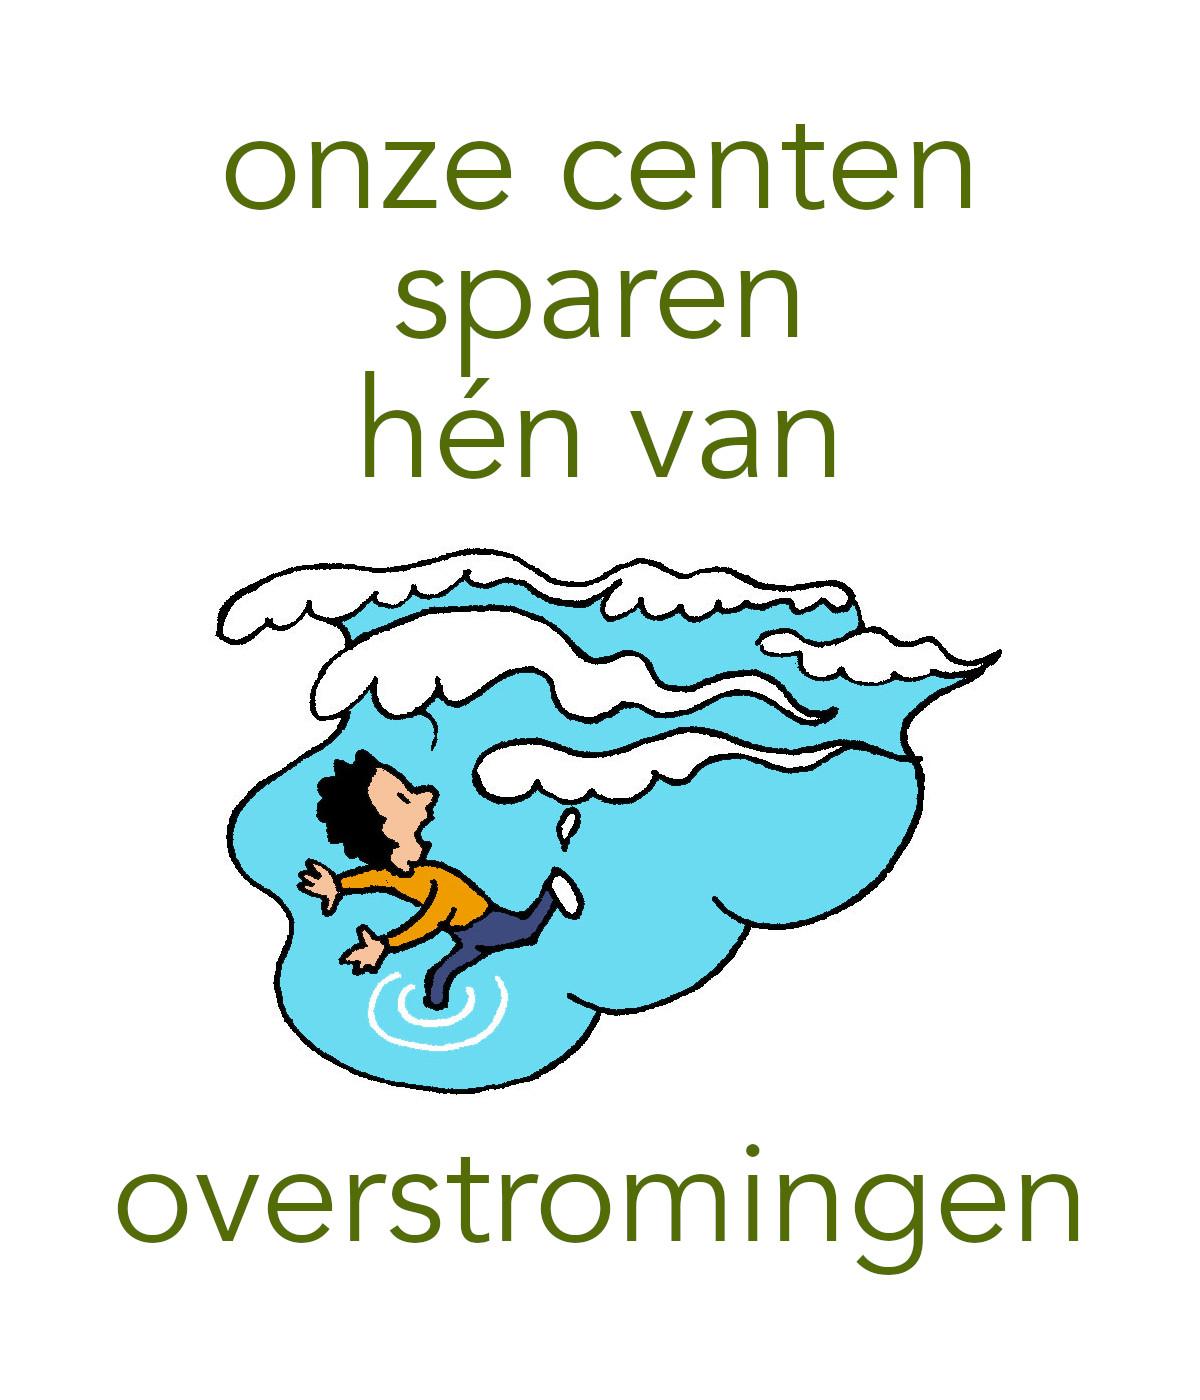 oc_overstroming